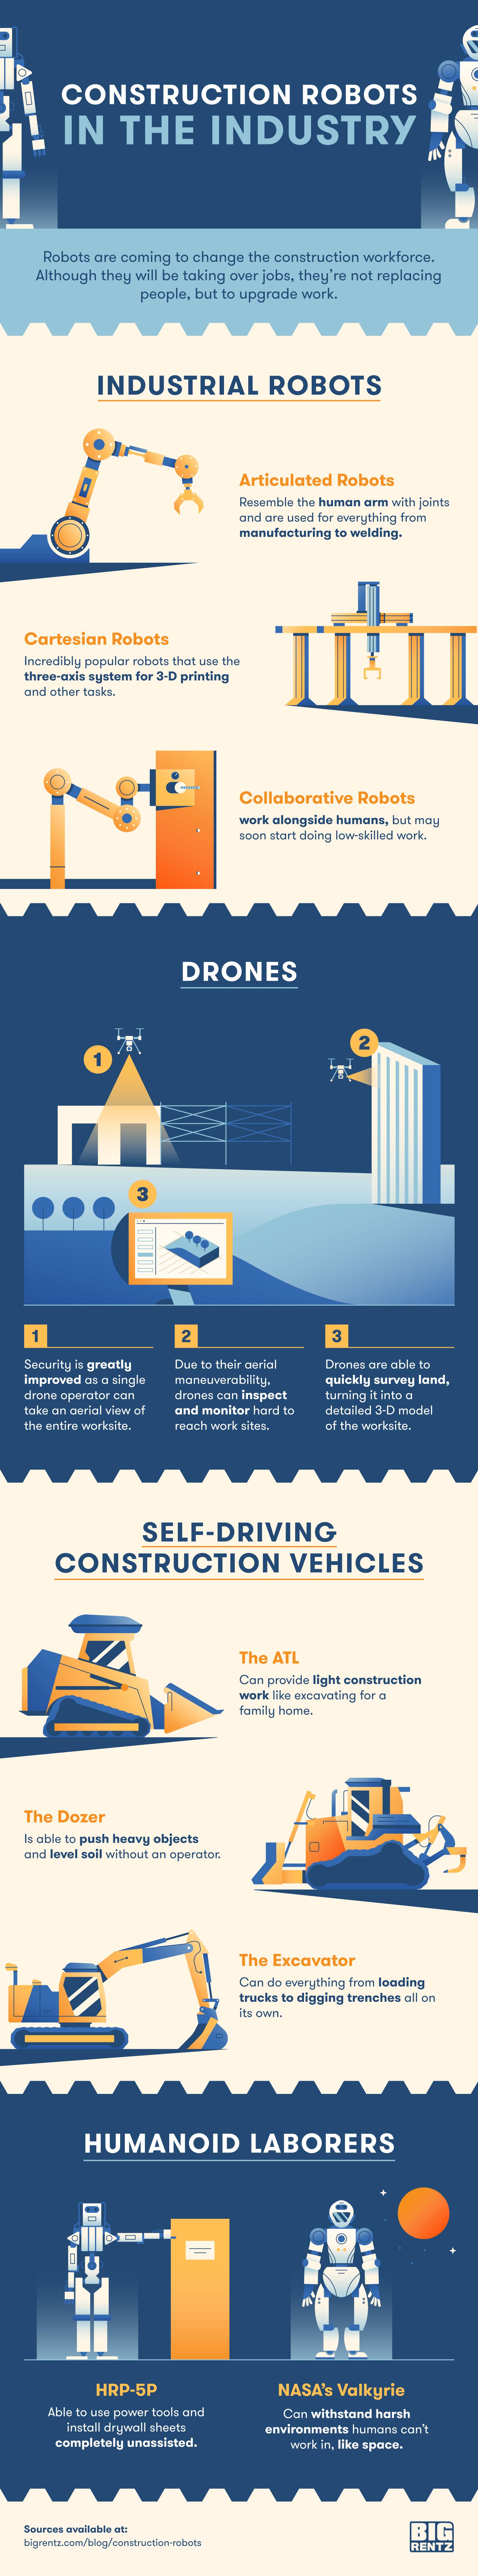 bigrentz construction robots infographic